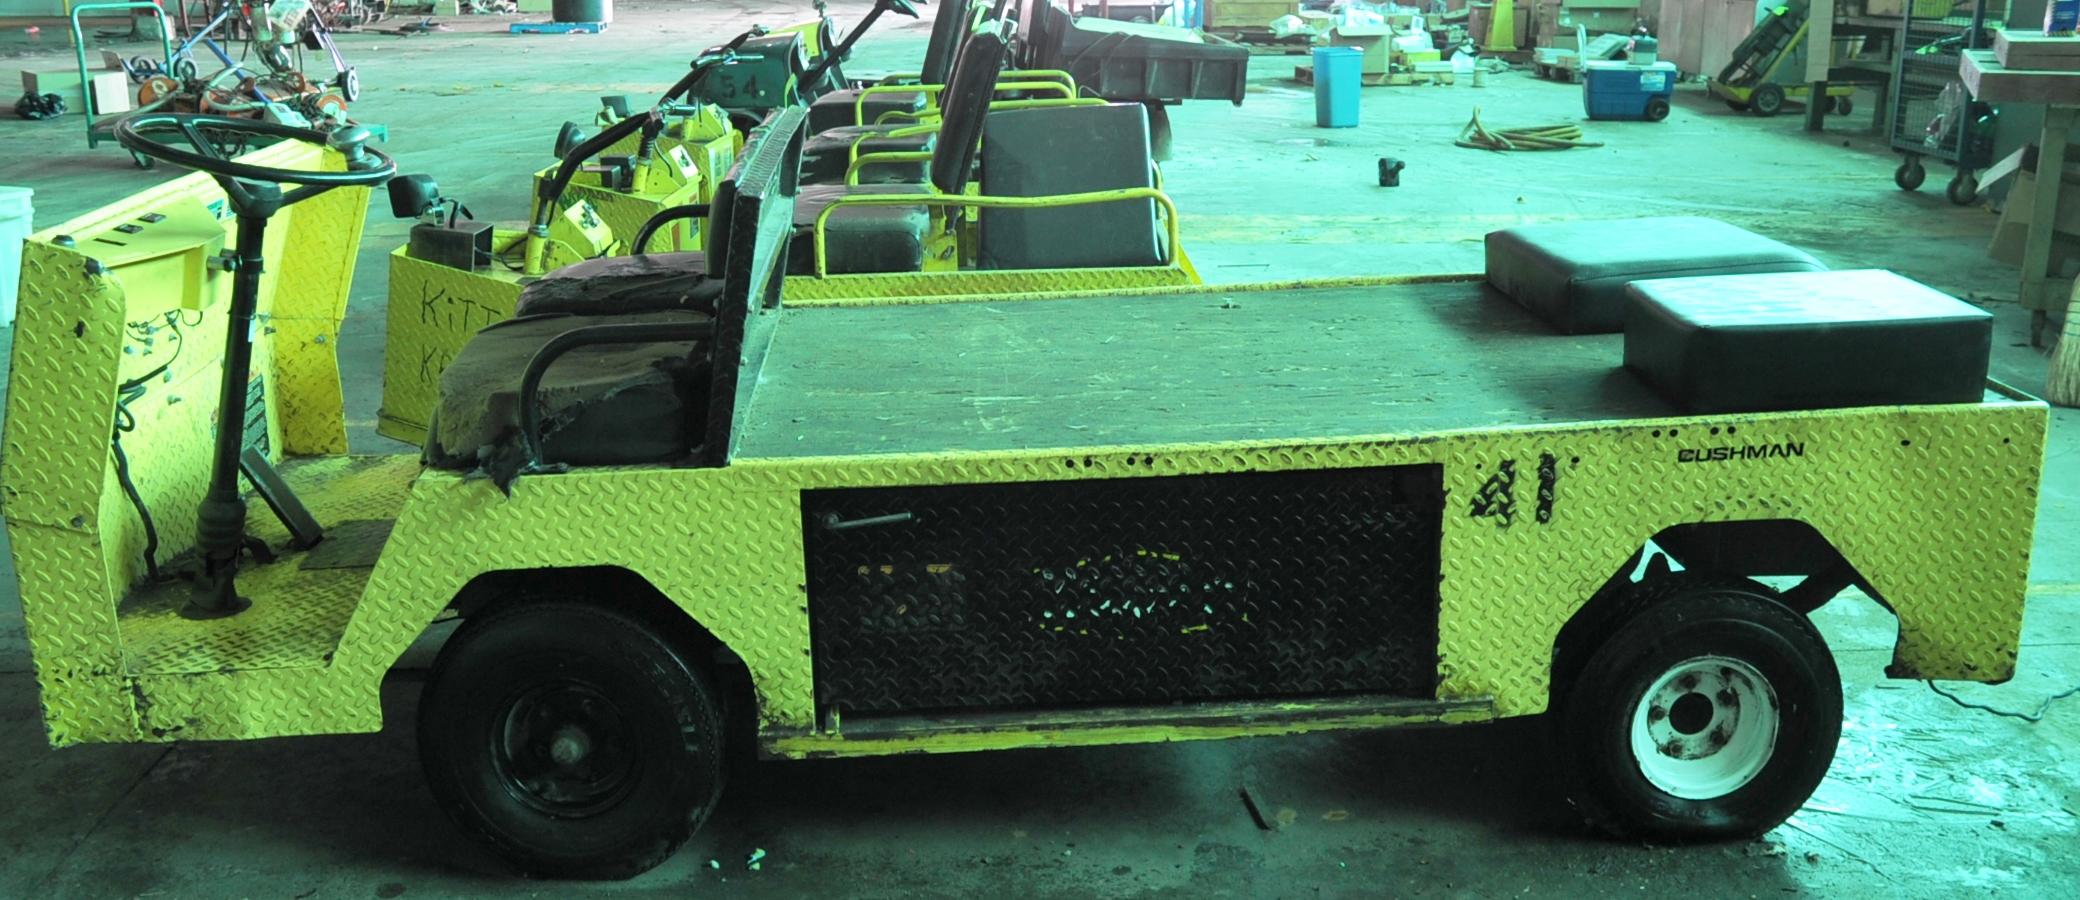 Lot 6 - Cushman Flat Bed Electric Powered Cart